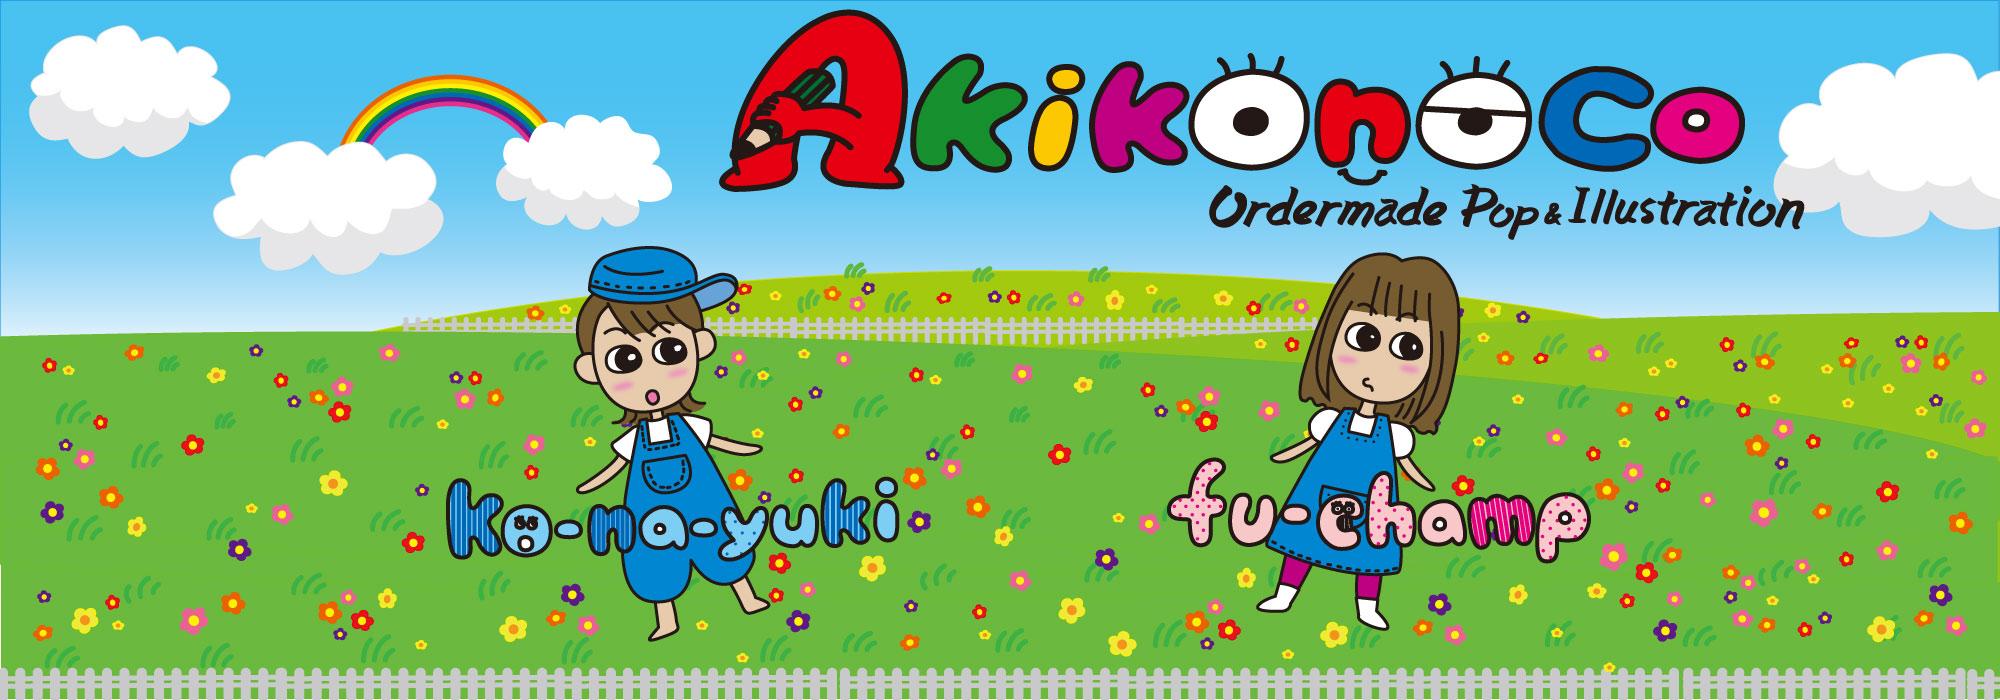 Akikonoco